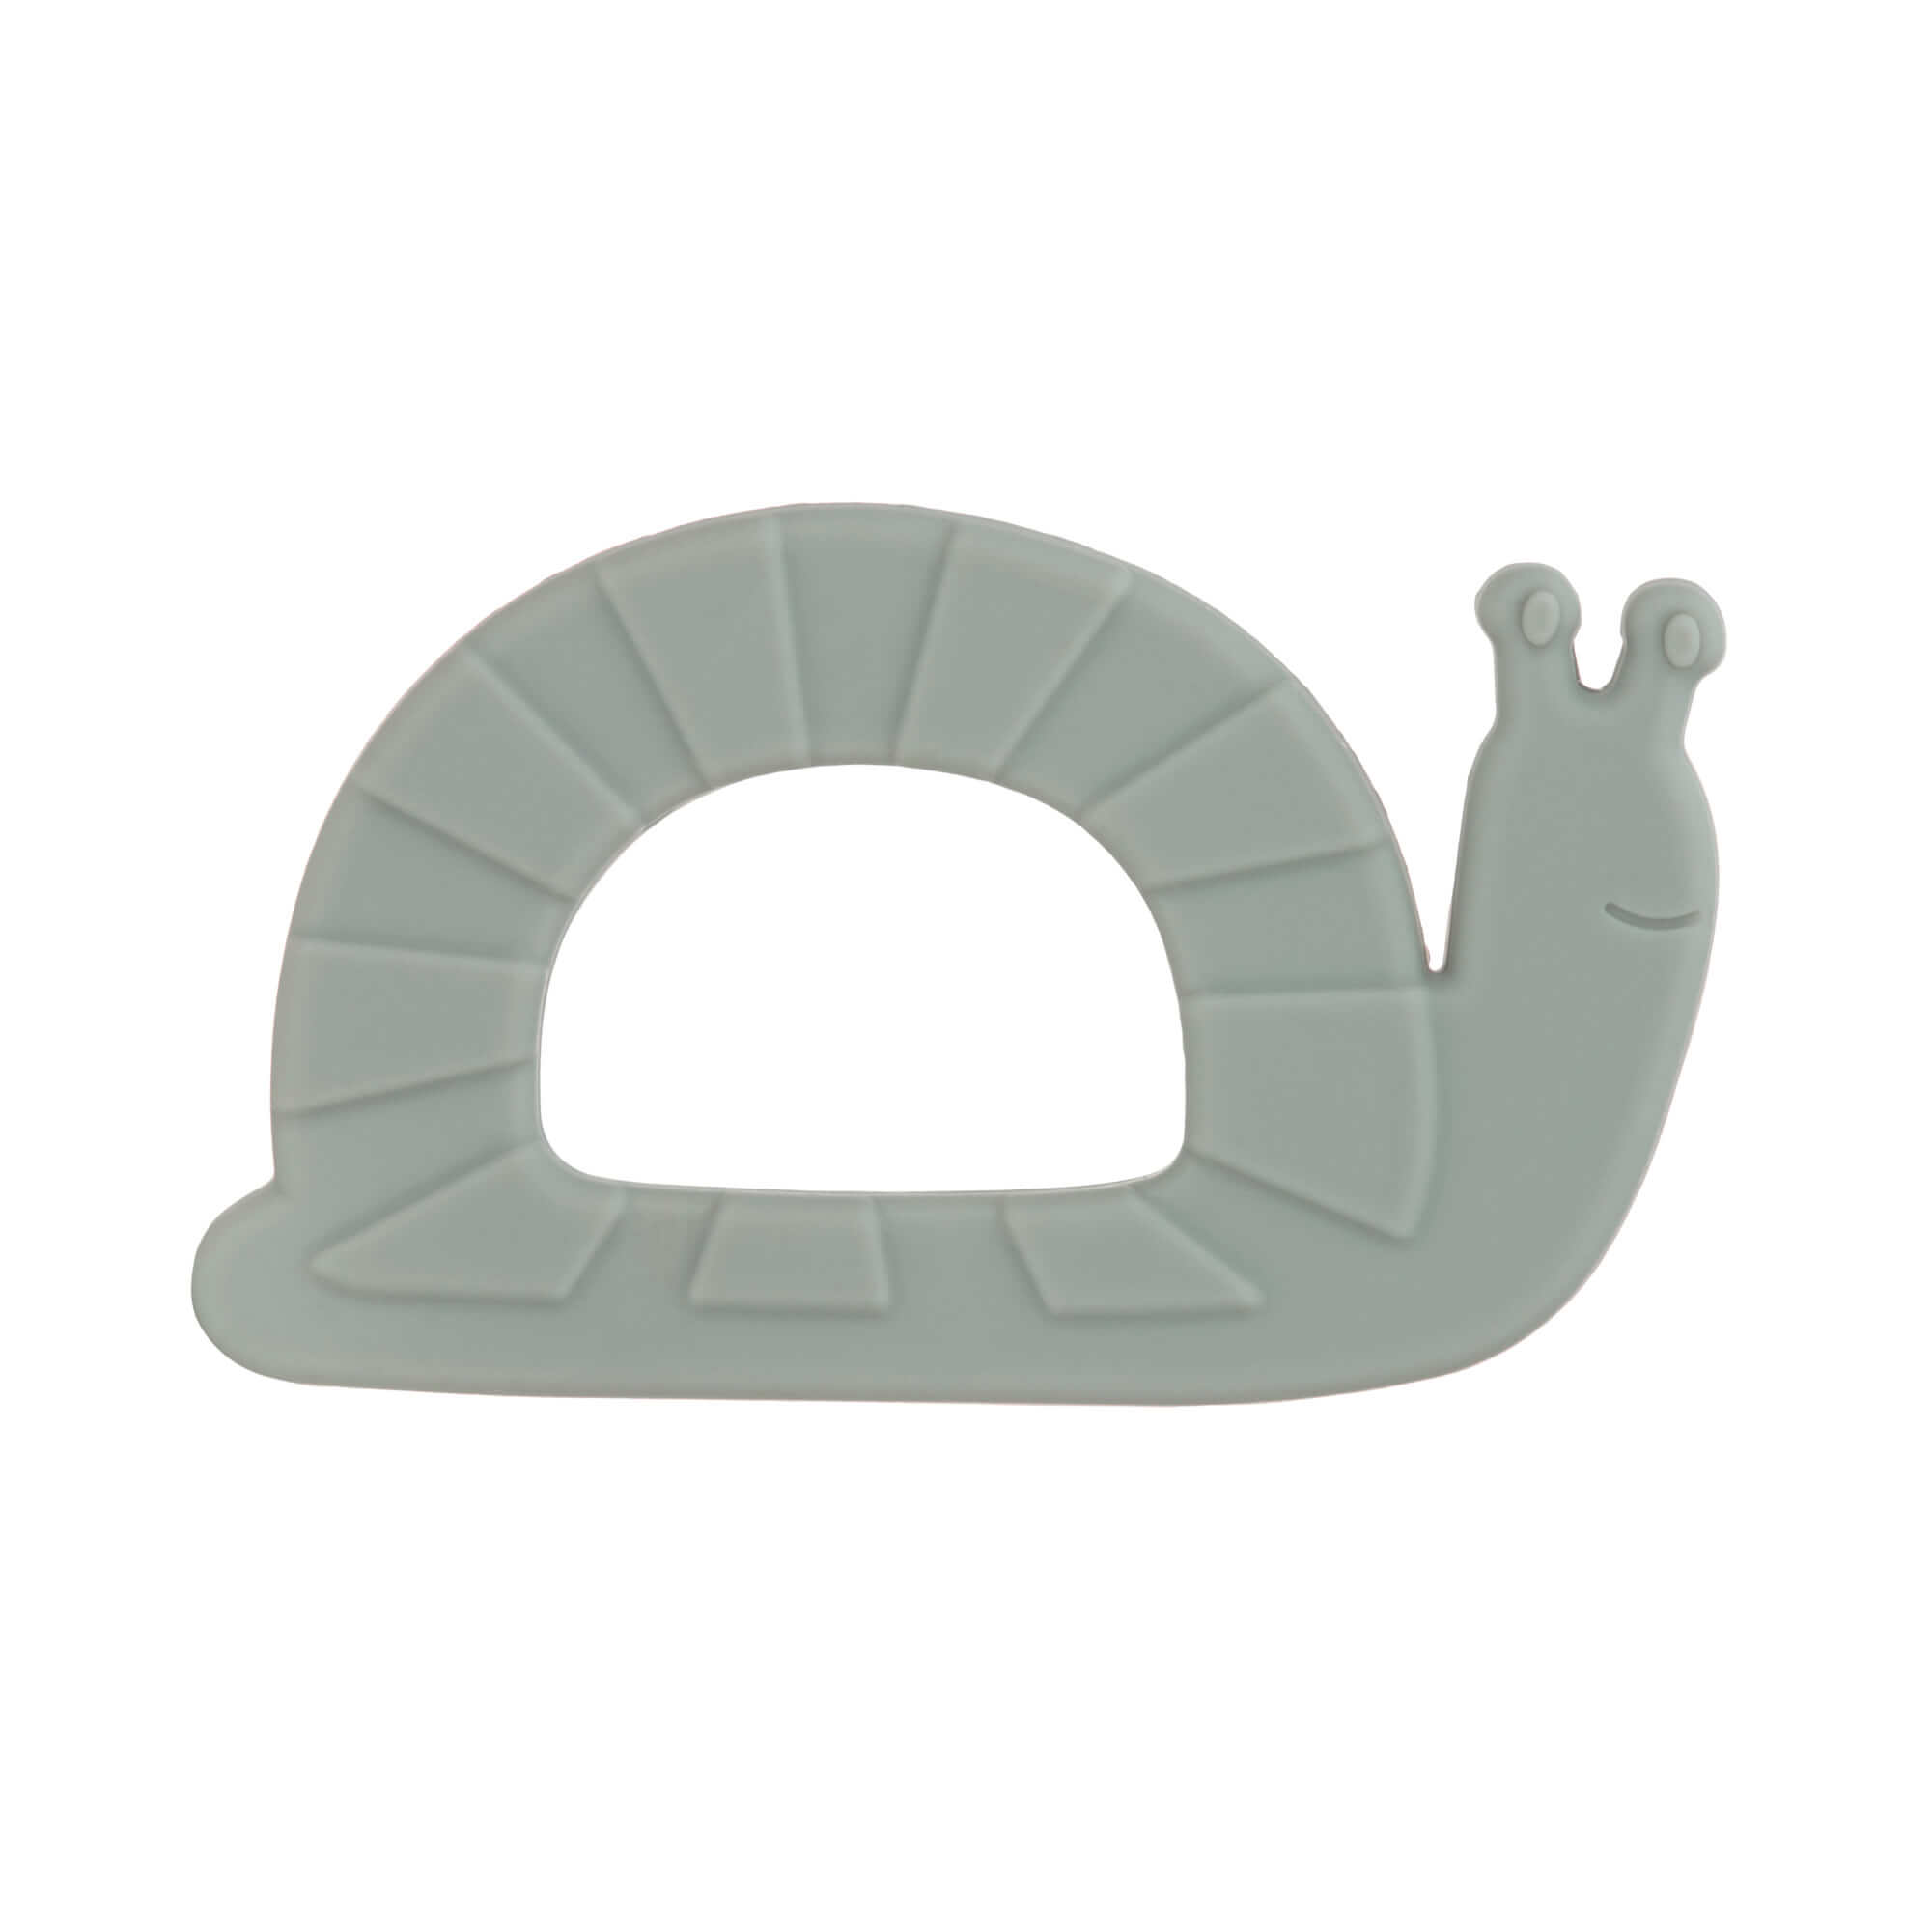 Baby Silikon-Beißring - Garden Explorer Snail - Lässig